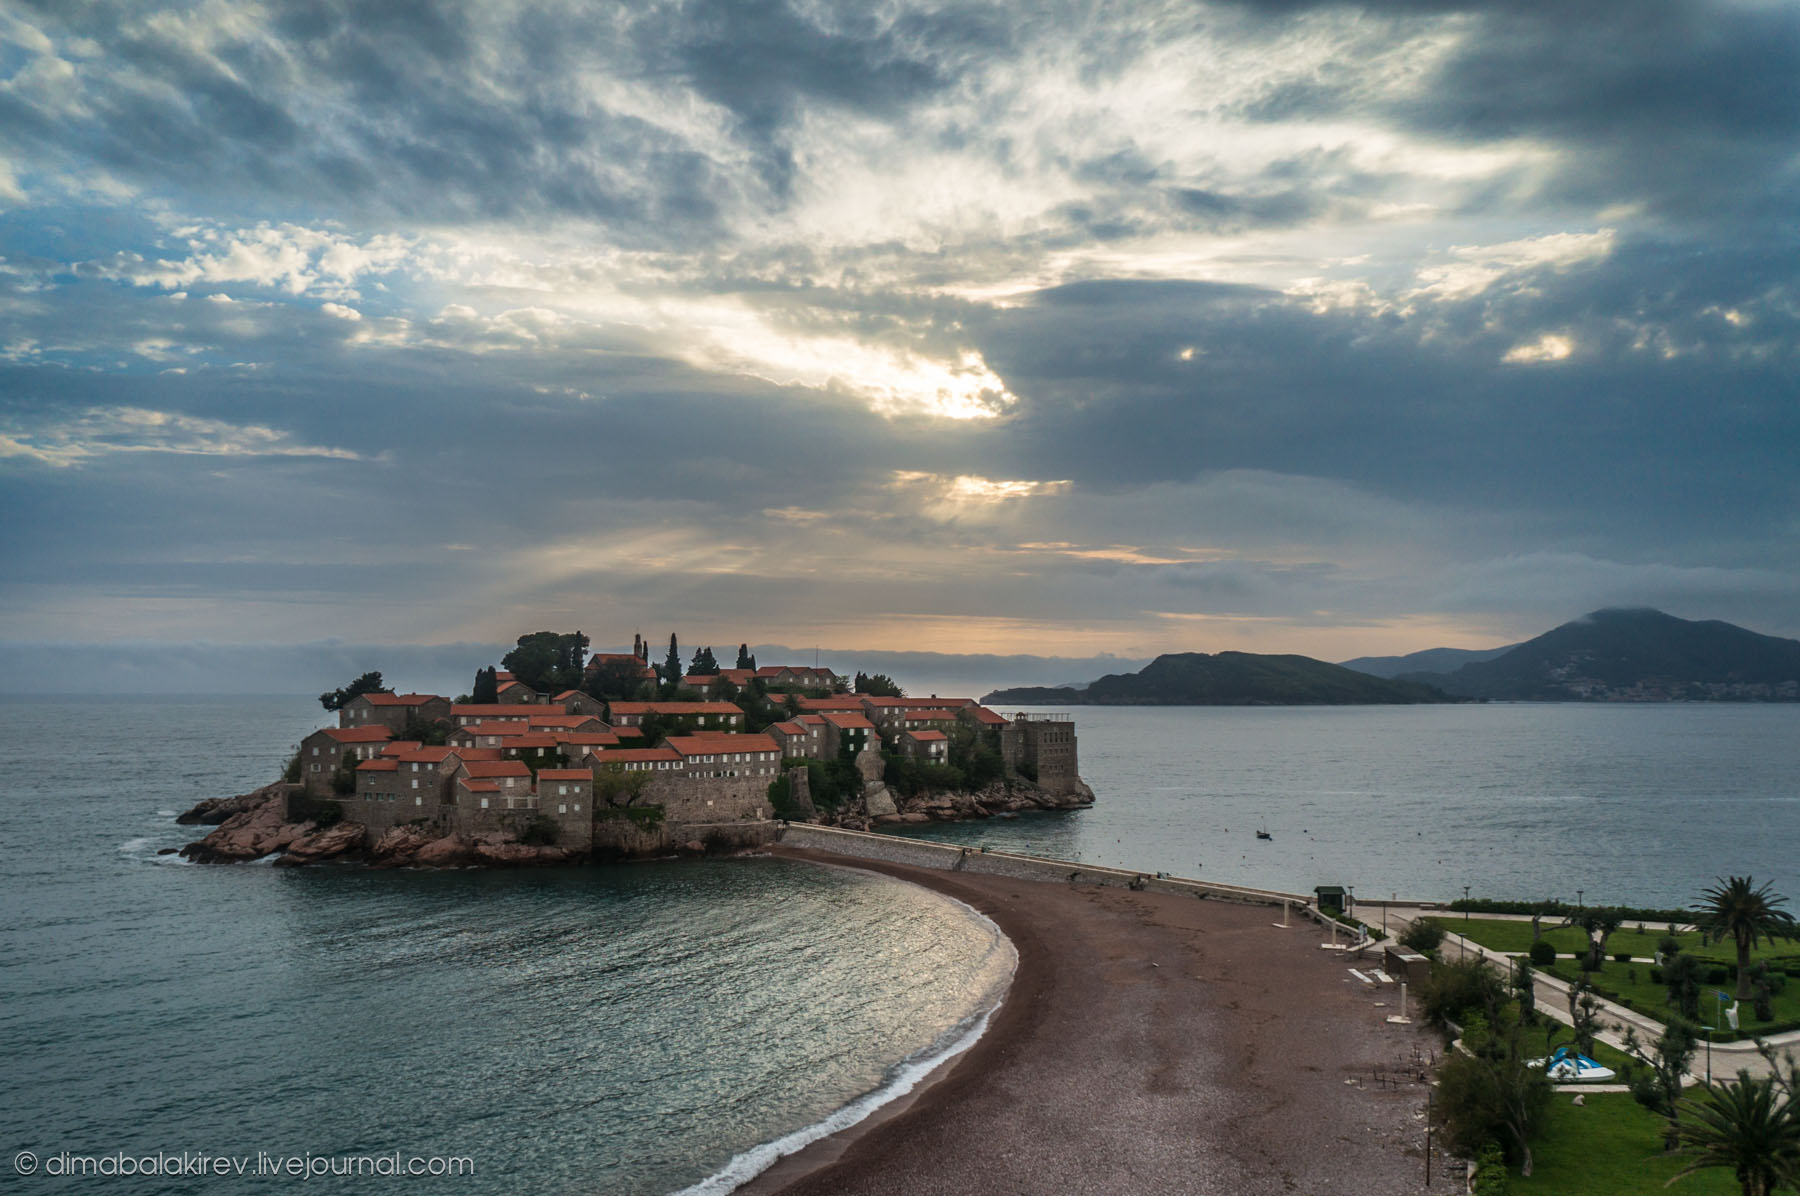 Sveti Stefan —остров Святого Стефана